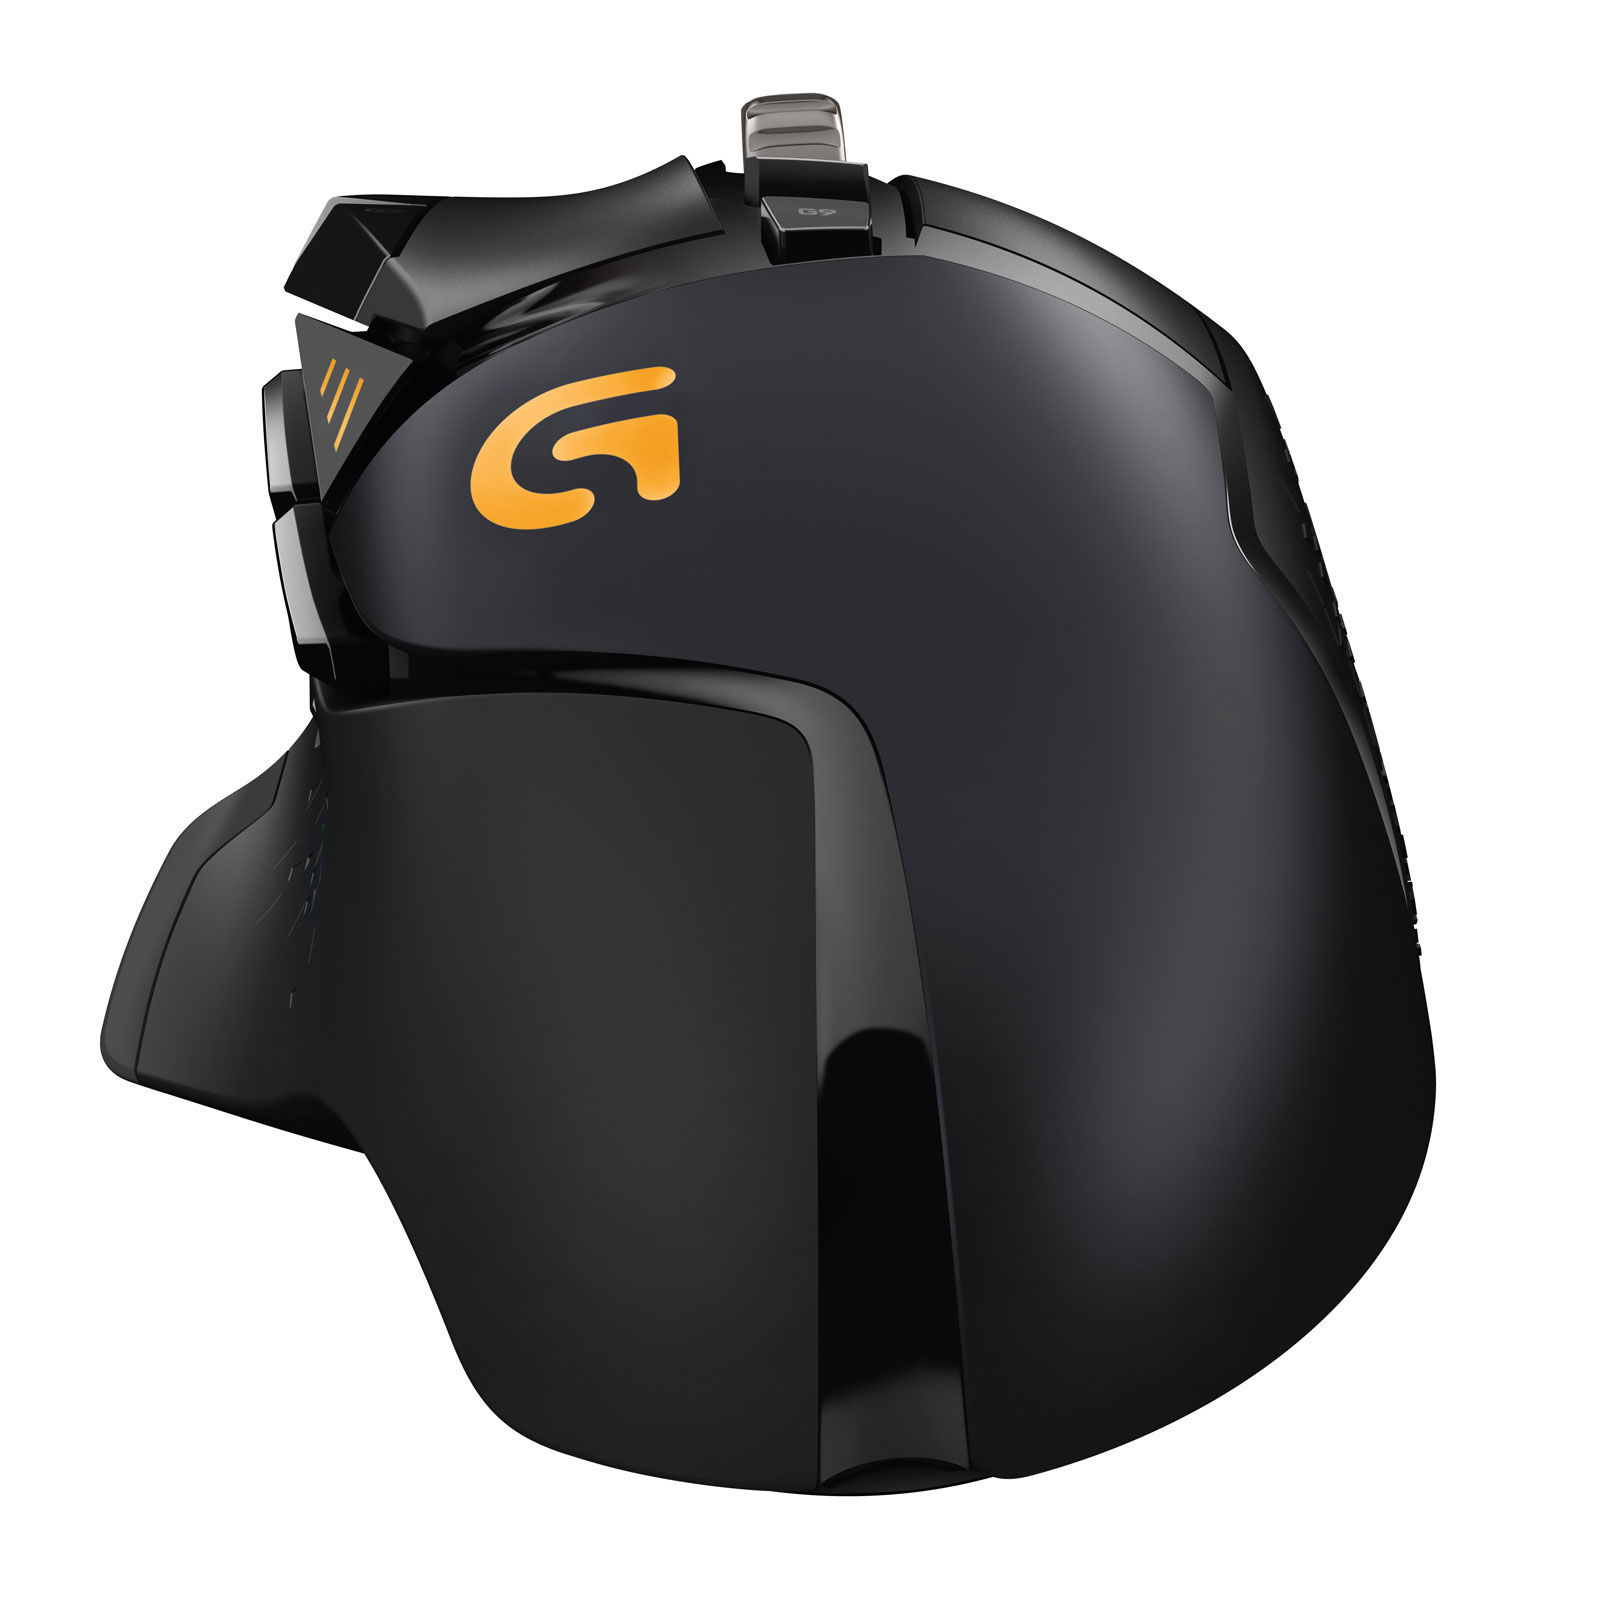 G502 PROTEUS SPECTRUM